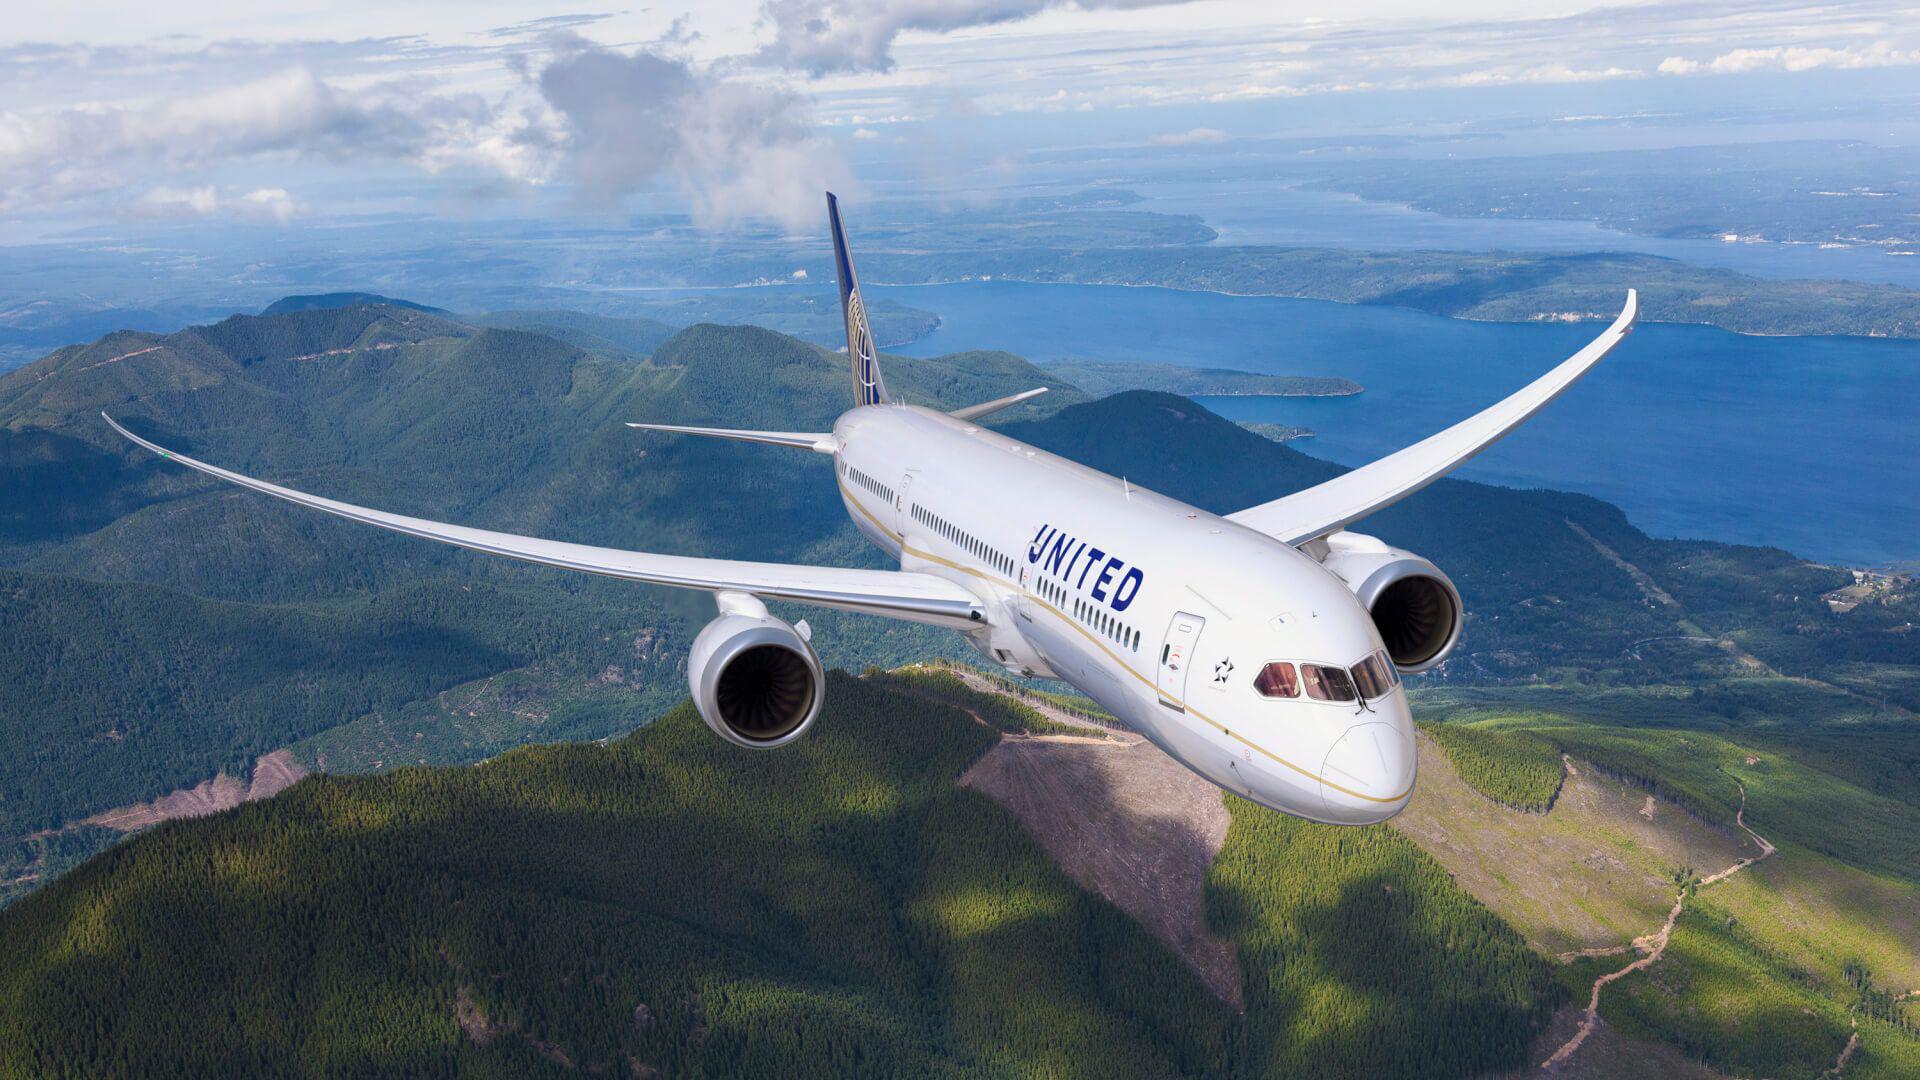 United Airlines Flight tracker